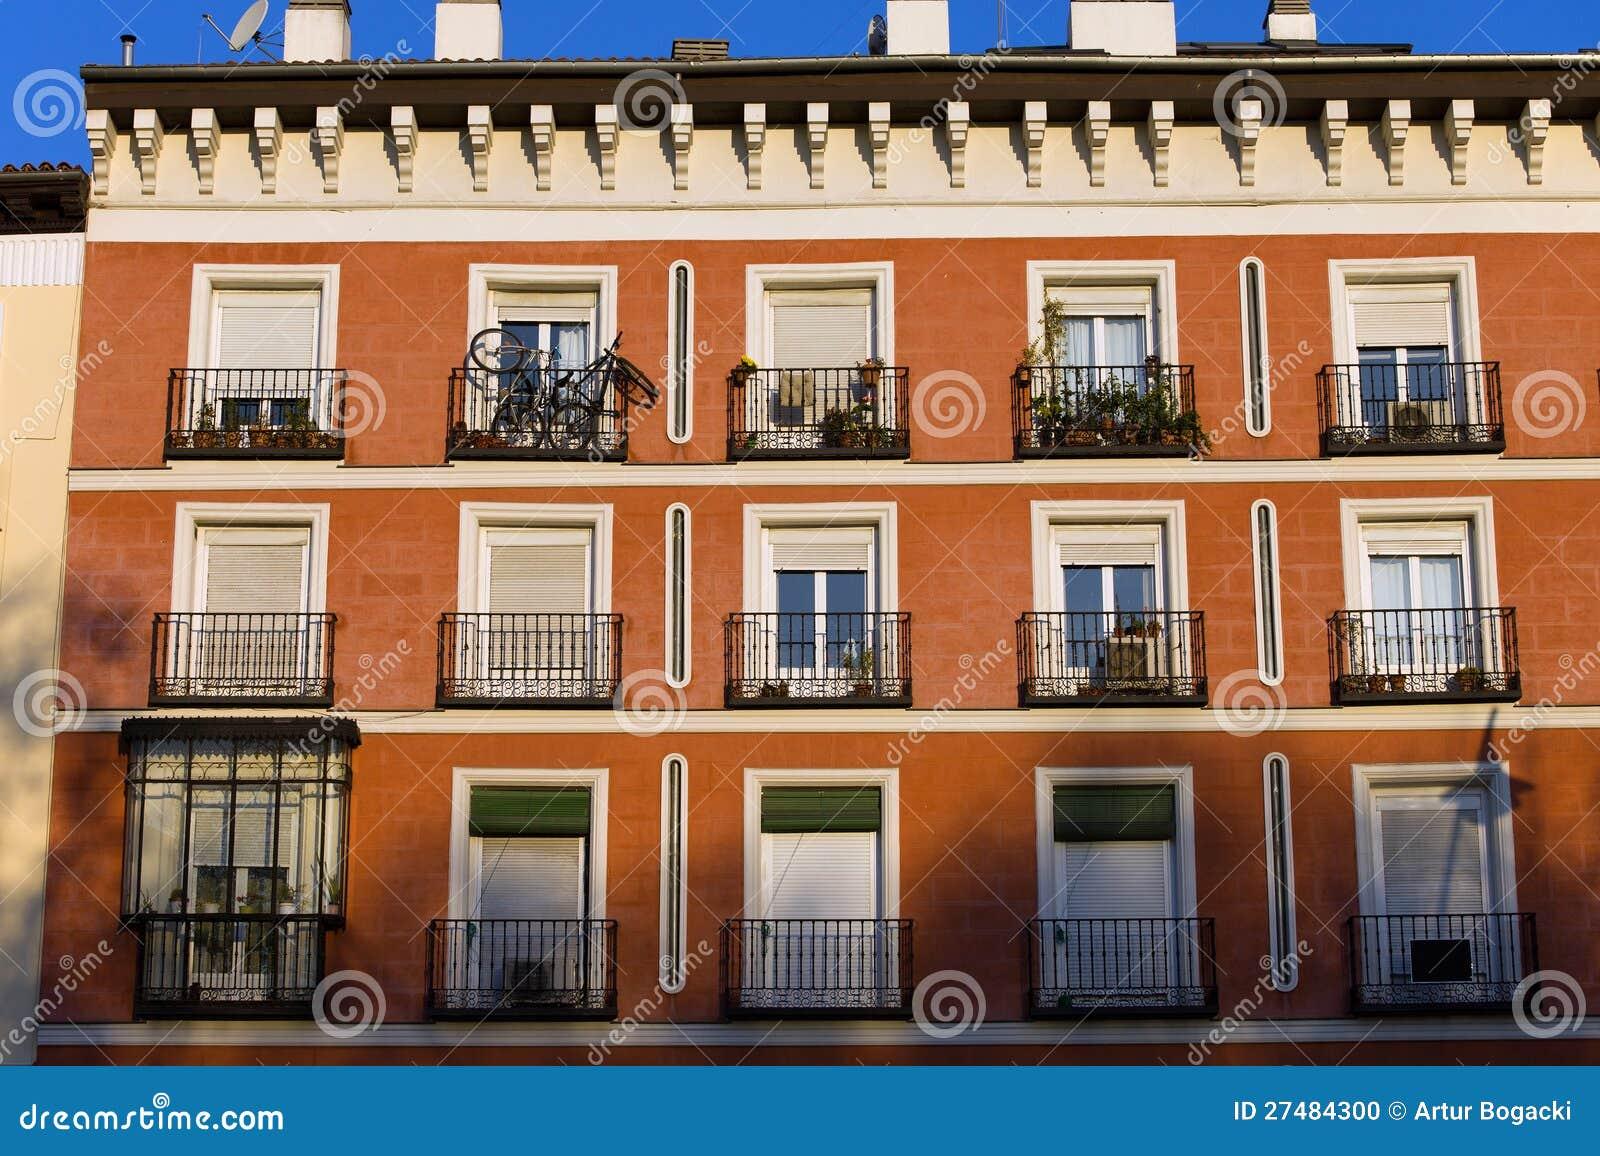 Wohnung-Haus-ot-Fassade Stockfoto - Bild: 27484300 size: 1300 x 956 post ID: 0 File size: 0 B